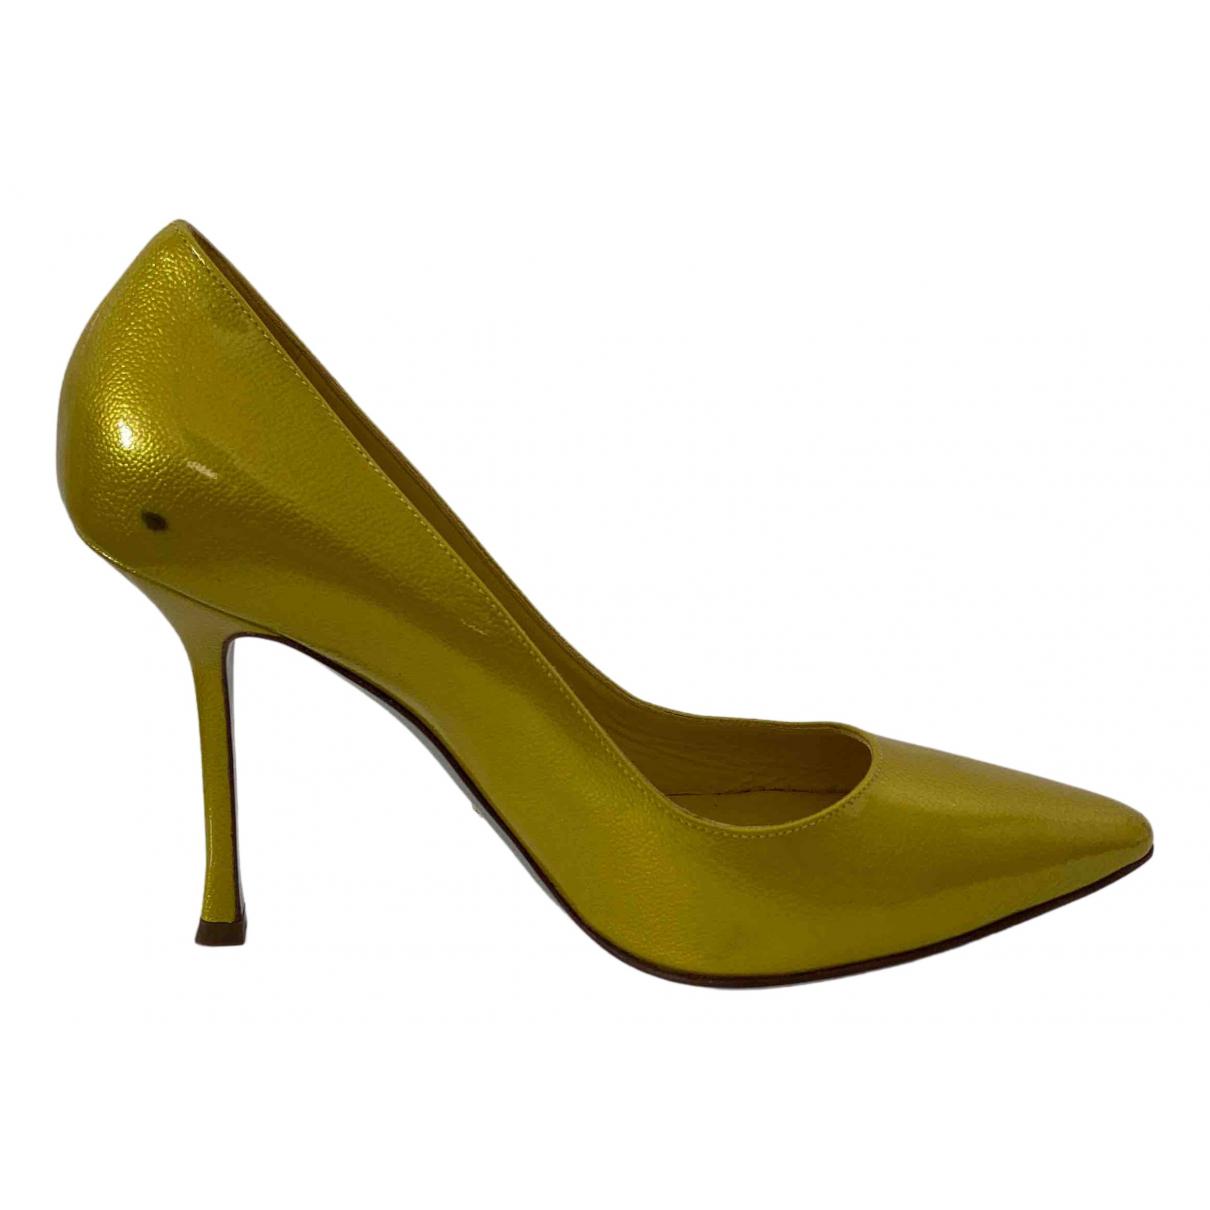 Sergio Rossi - Escarpins   pour femme en cuir - jaune